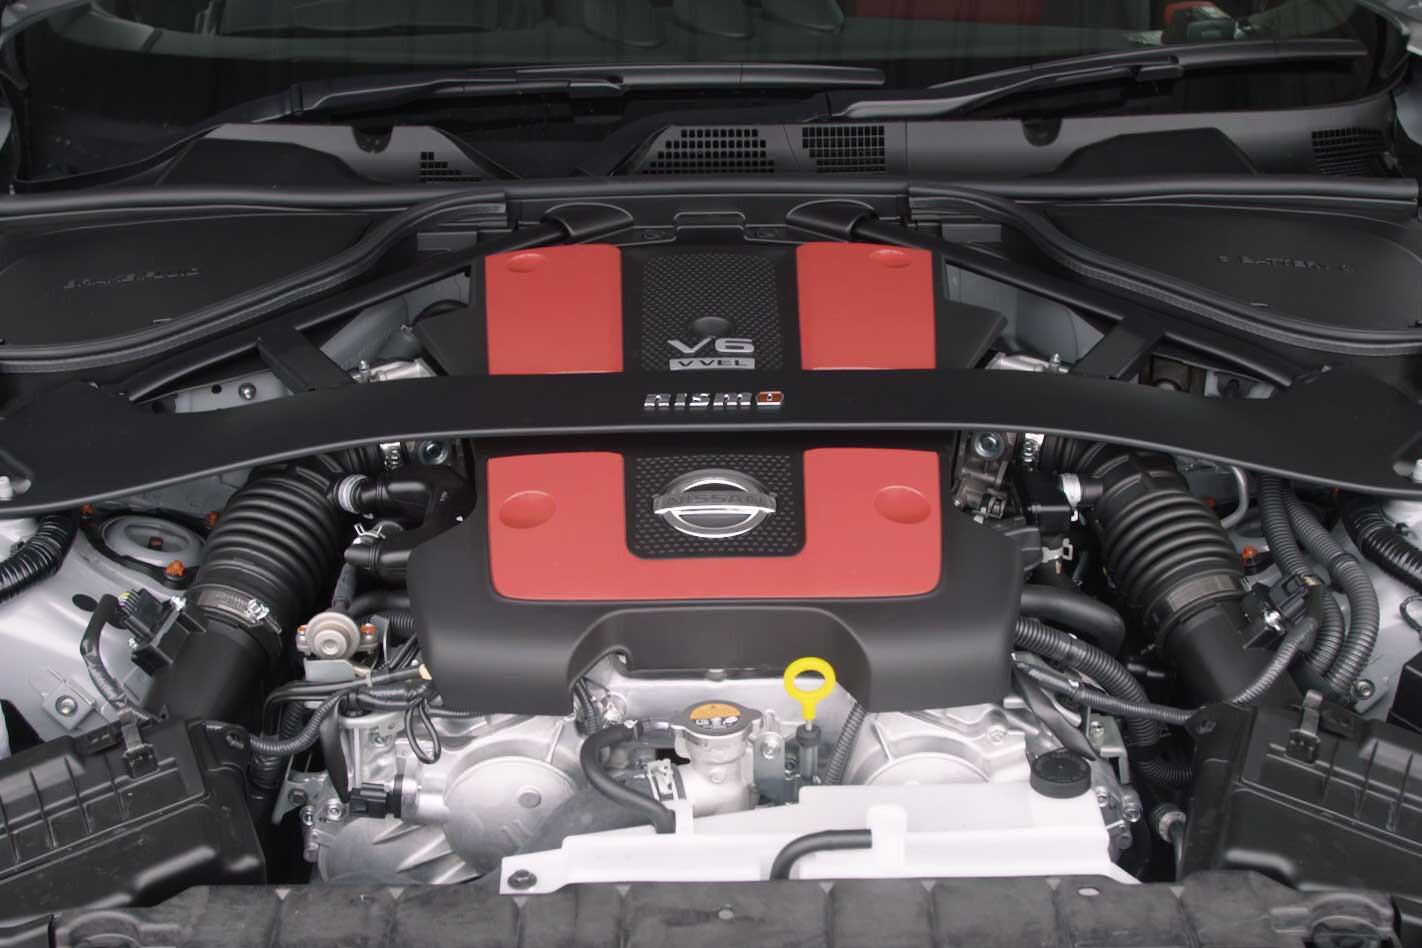 N Issan 370 Z Nismo Engine Jpg